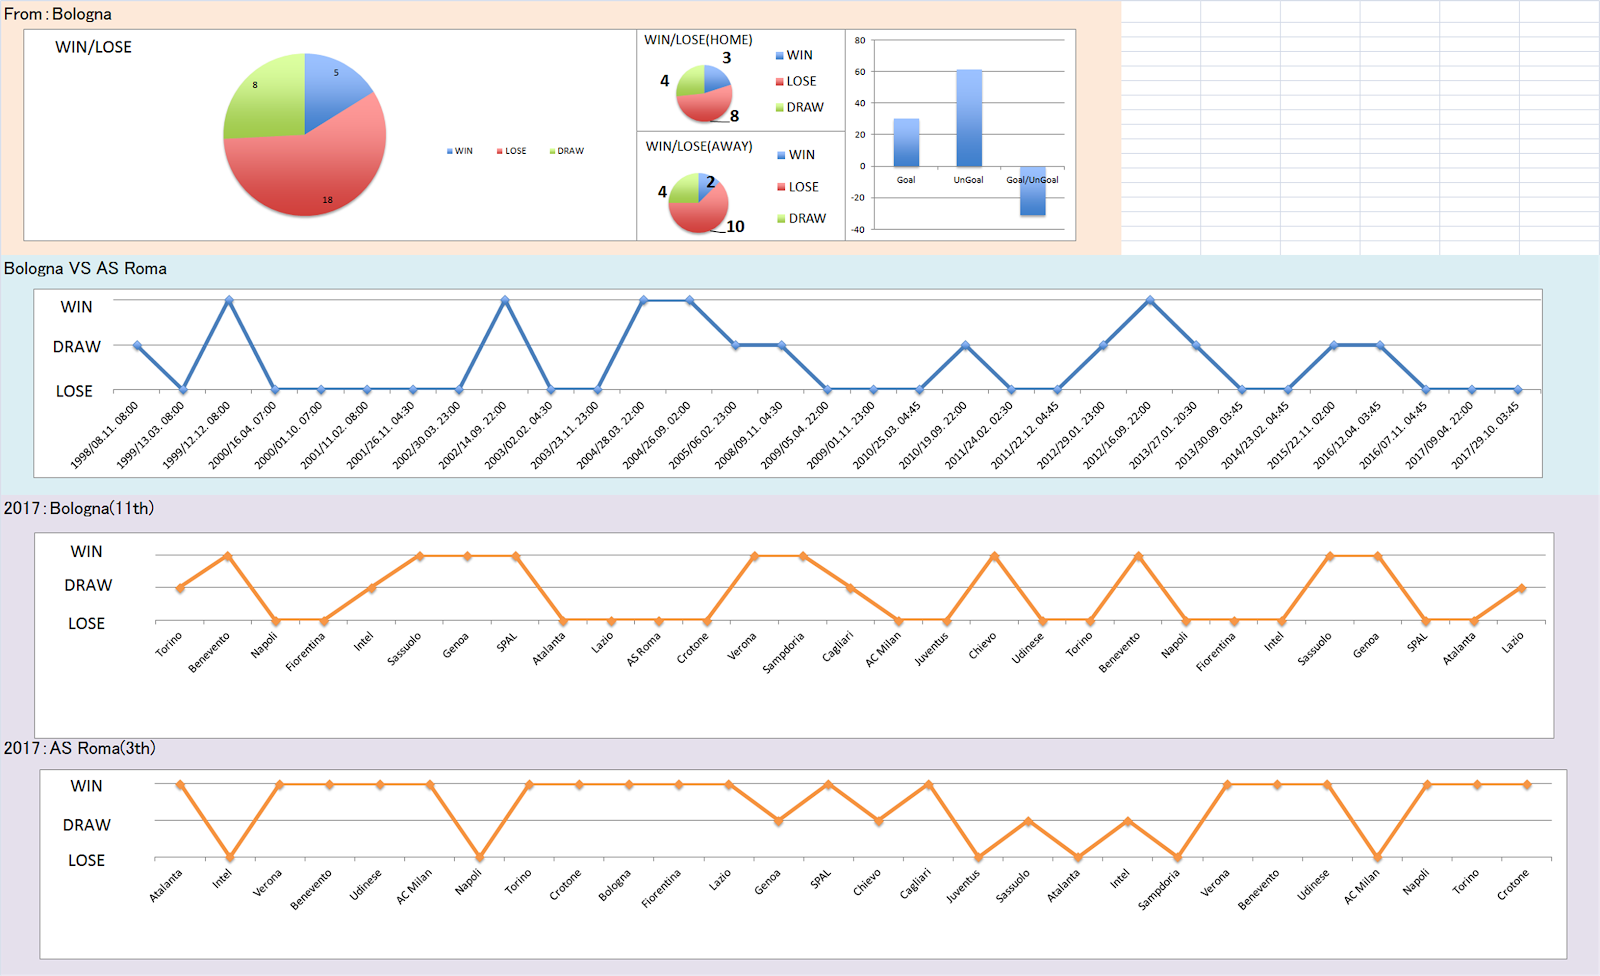 Football analysis data Premier League, Bundesliga, Liga